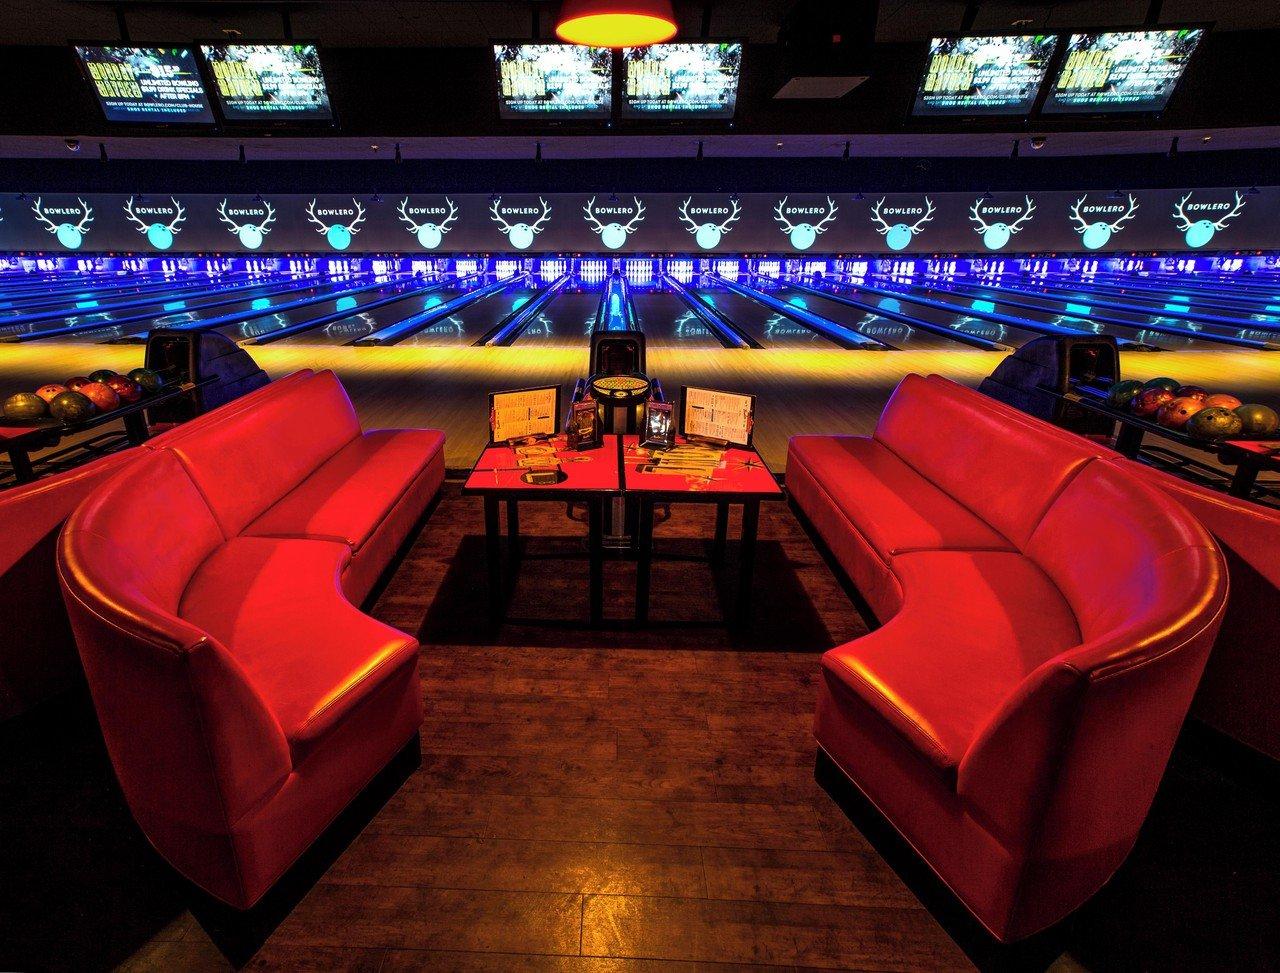 Rest der Welt corporate event venues Partyraum Bowlero Woodlamds #413 (CA) image 0